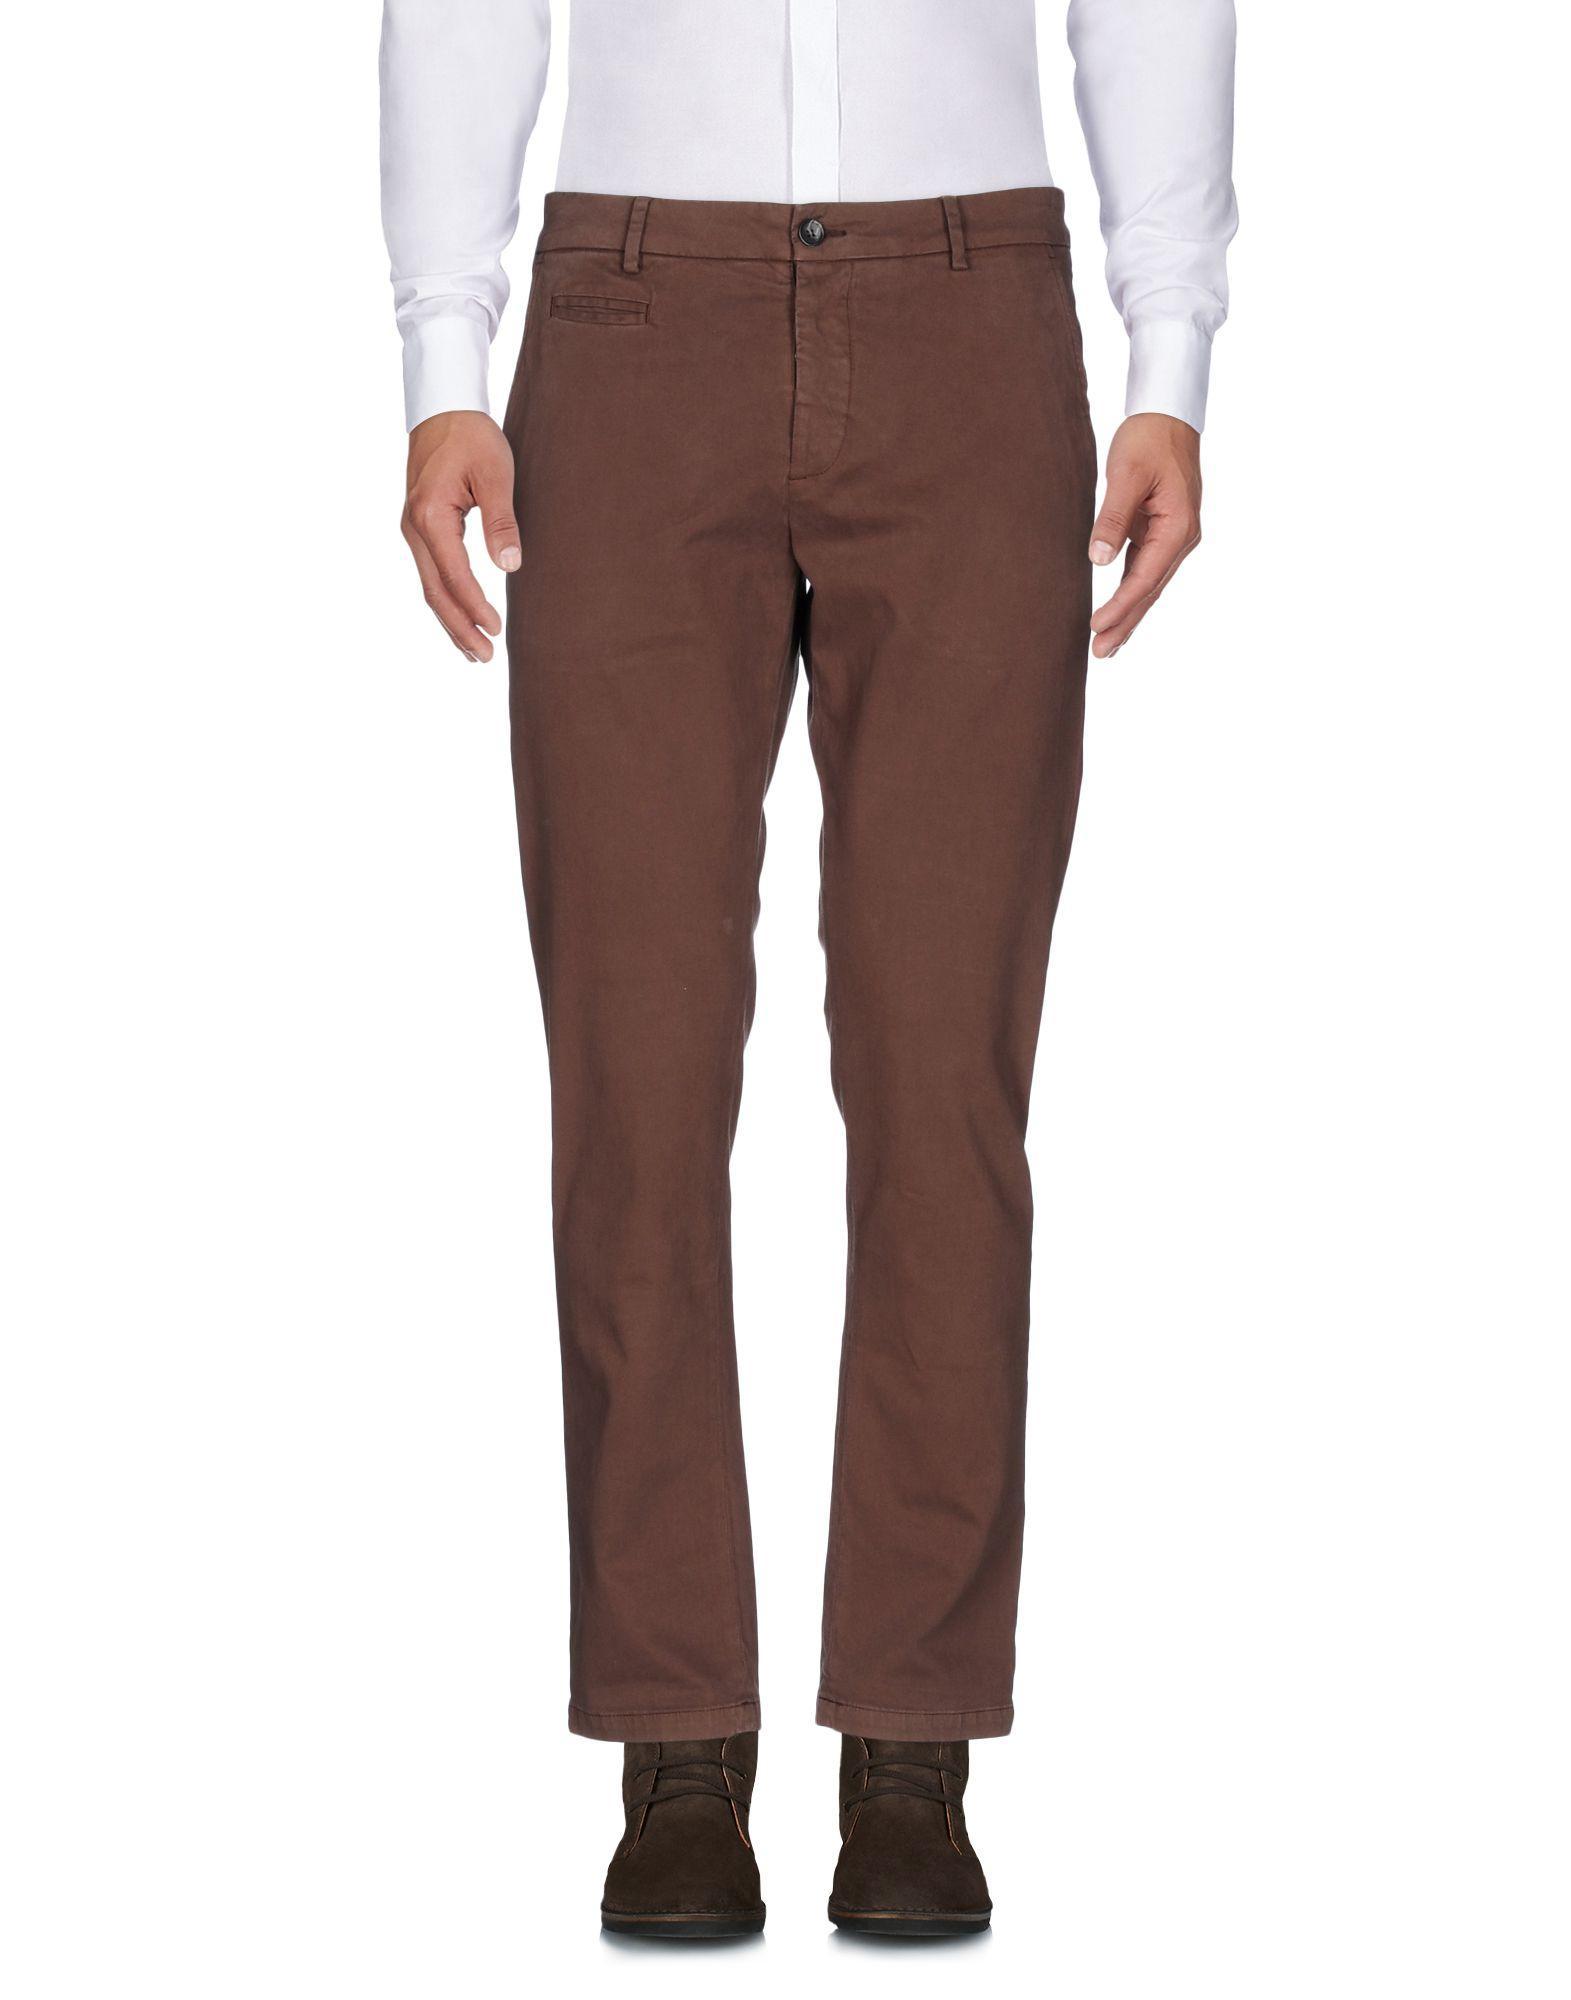 Low Brand Casual Pants In Dark Brown